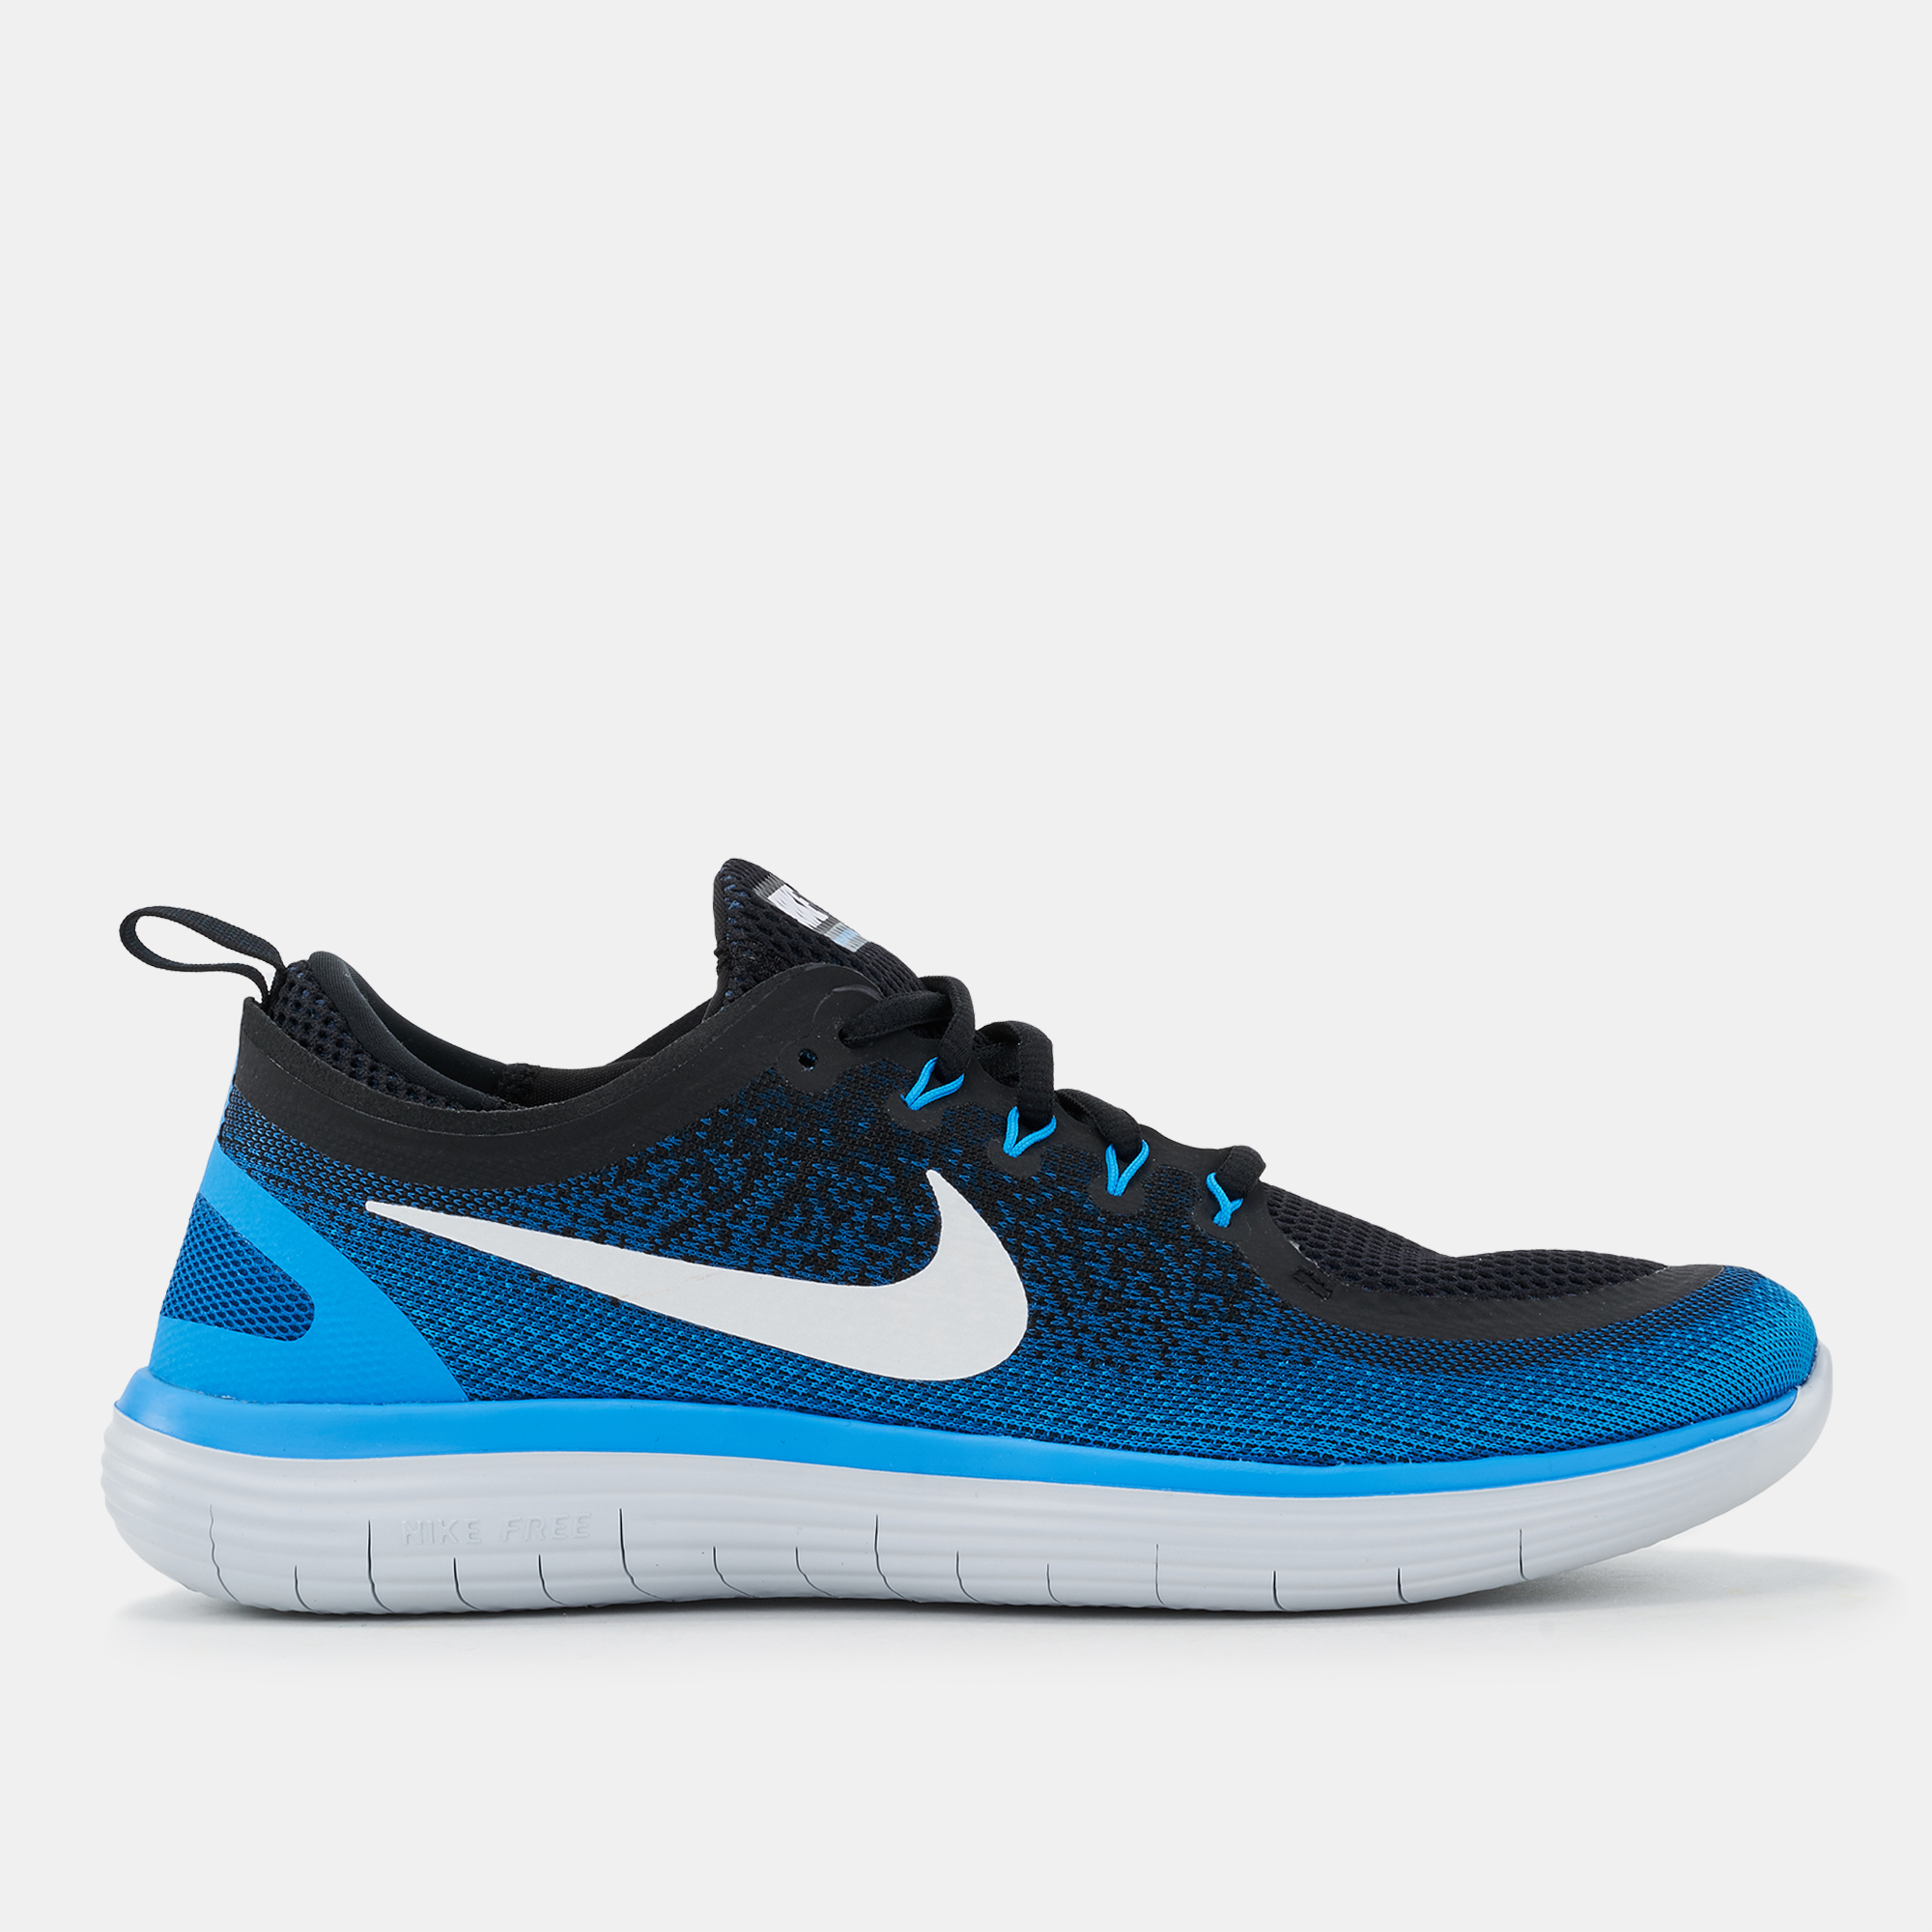 98156ef1324c Nike Free Rn Distance 2 Running Shoe Nike863775 401 in Riyadh